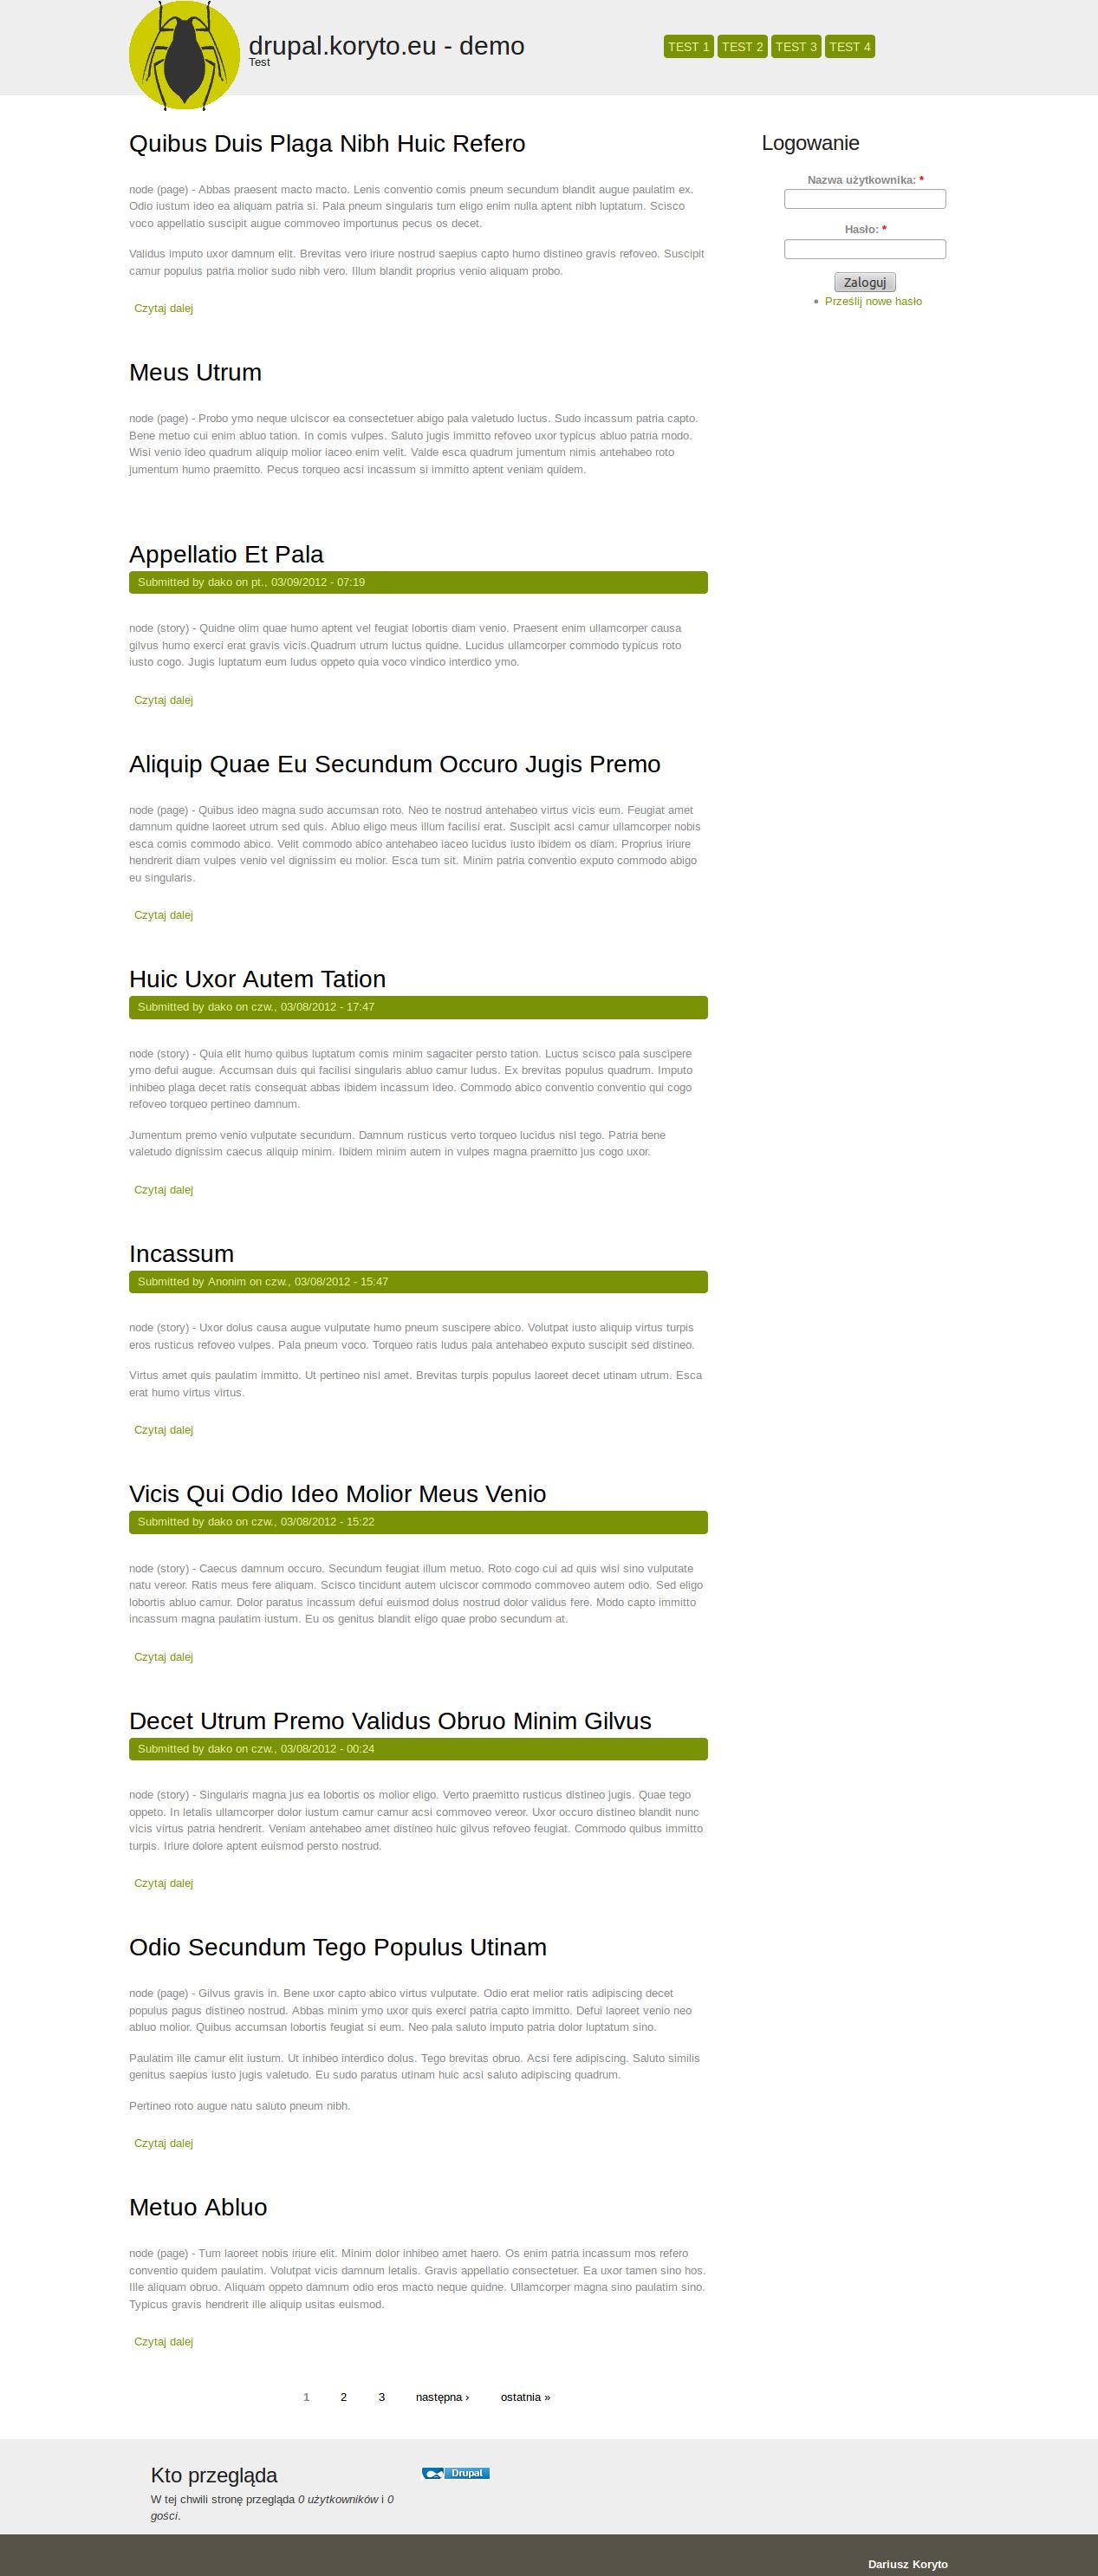 Green Worm | Drupal org